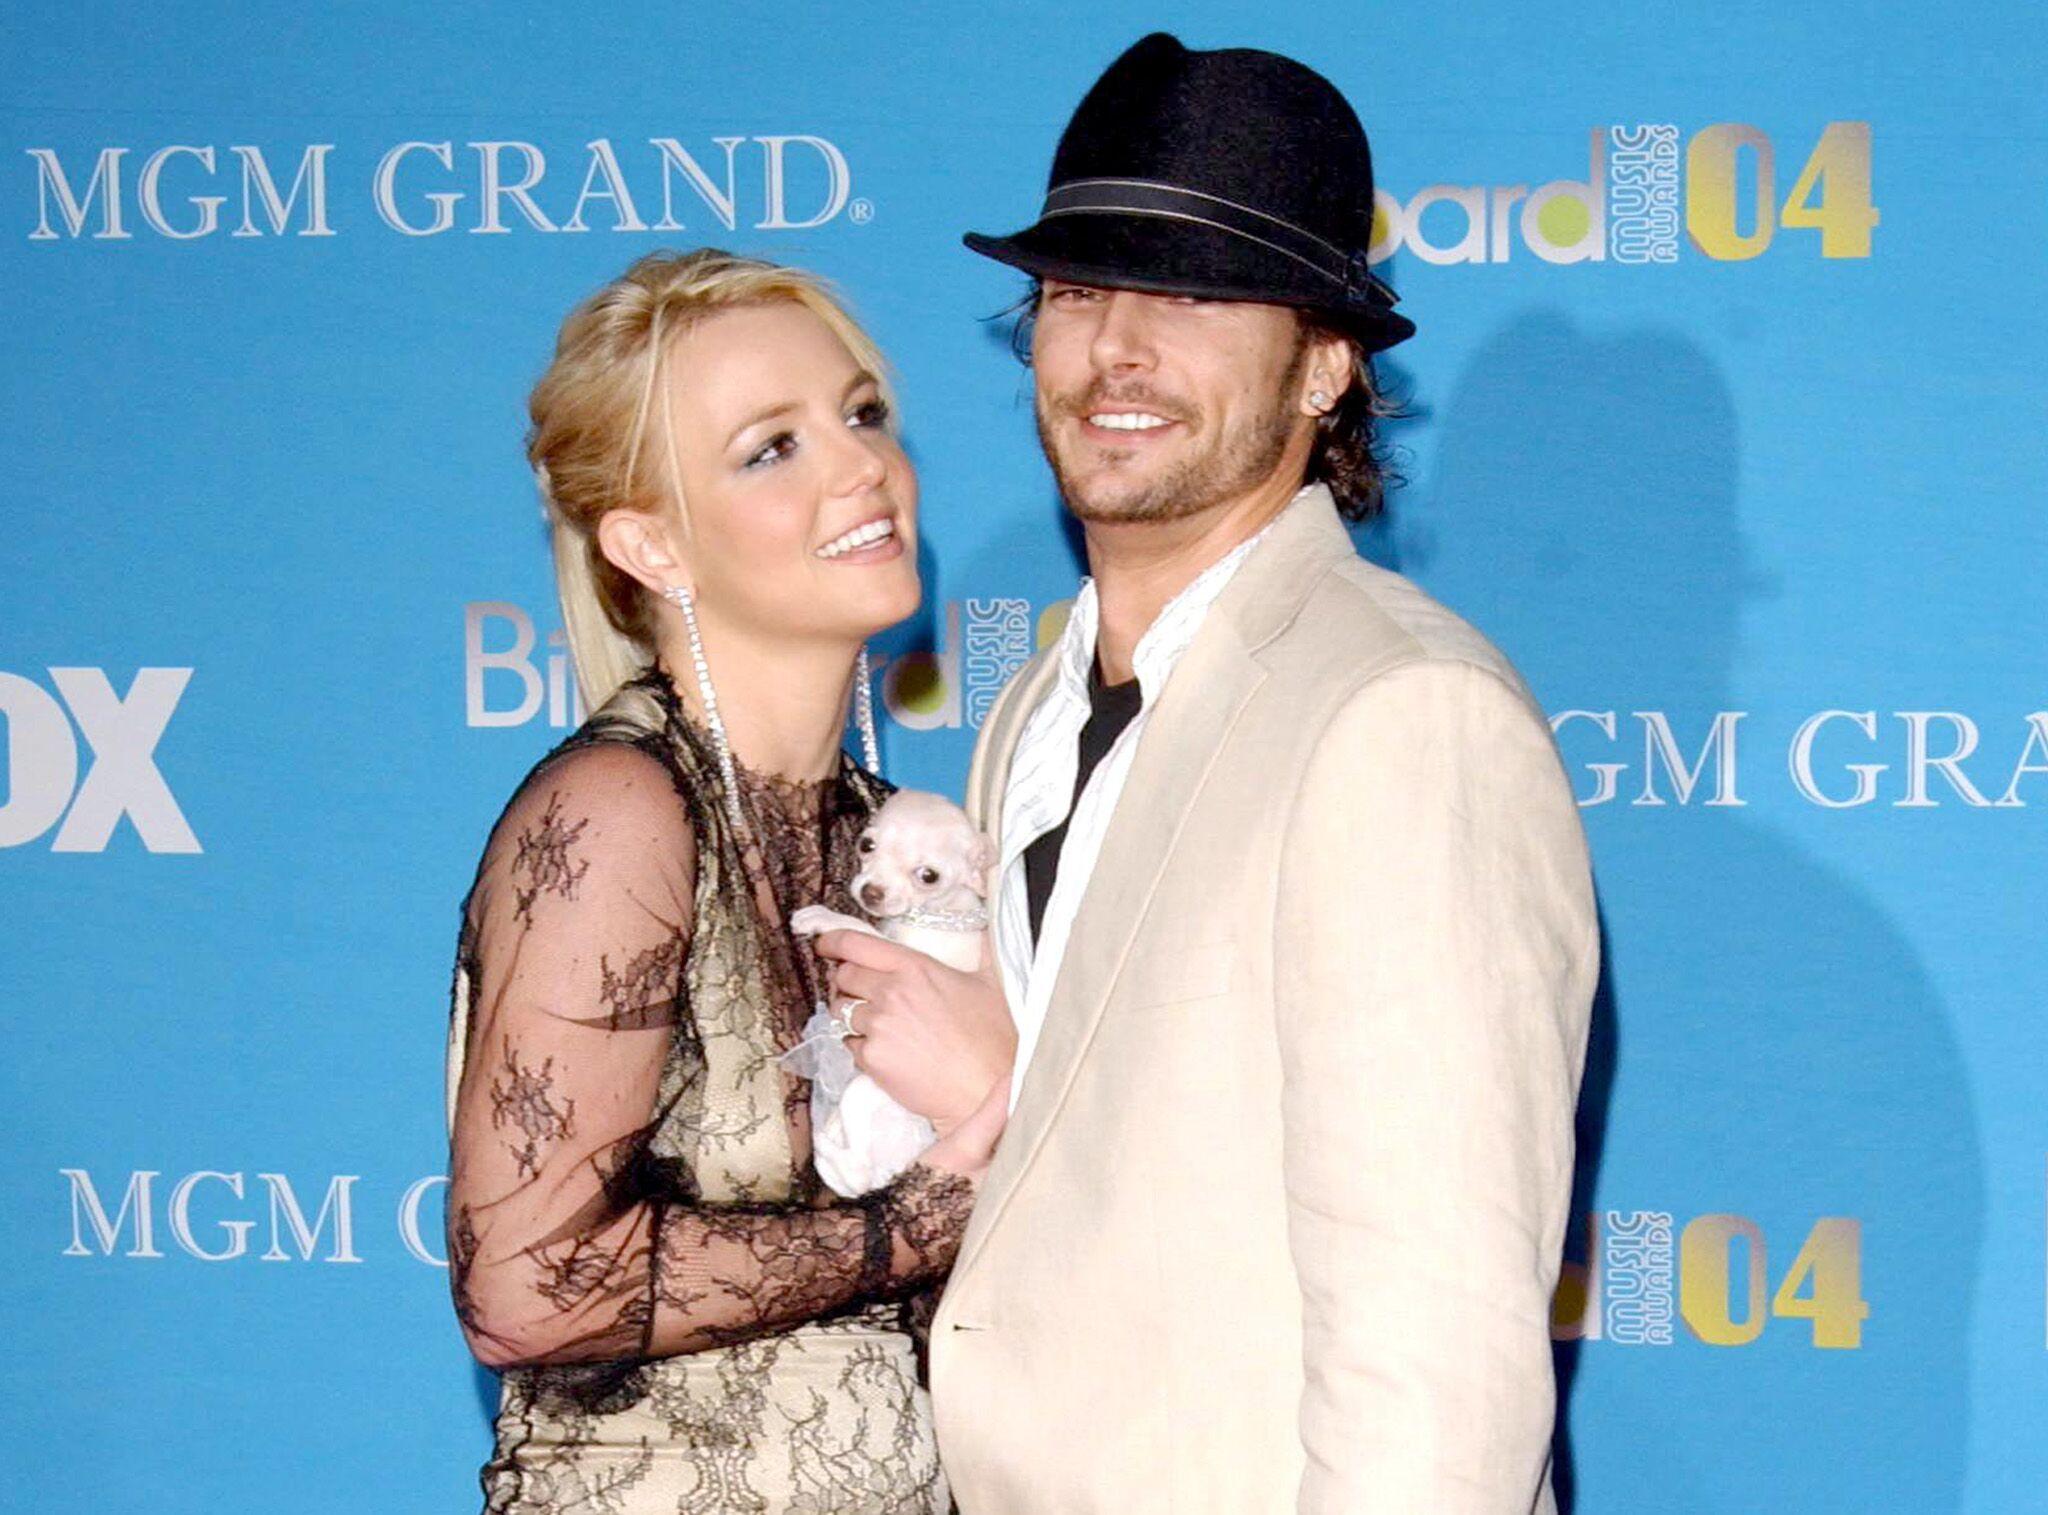 Kevin Federline ne regrette pas son mariage avec Britney